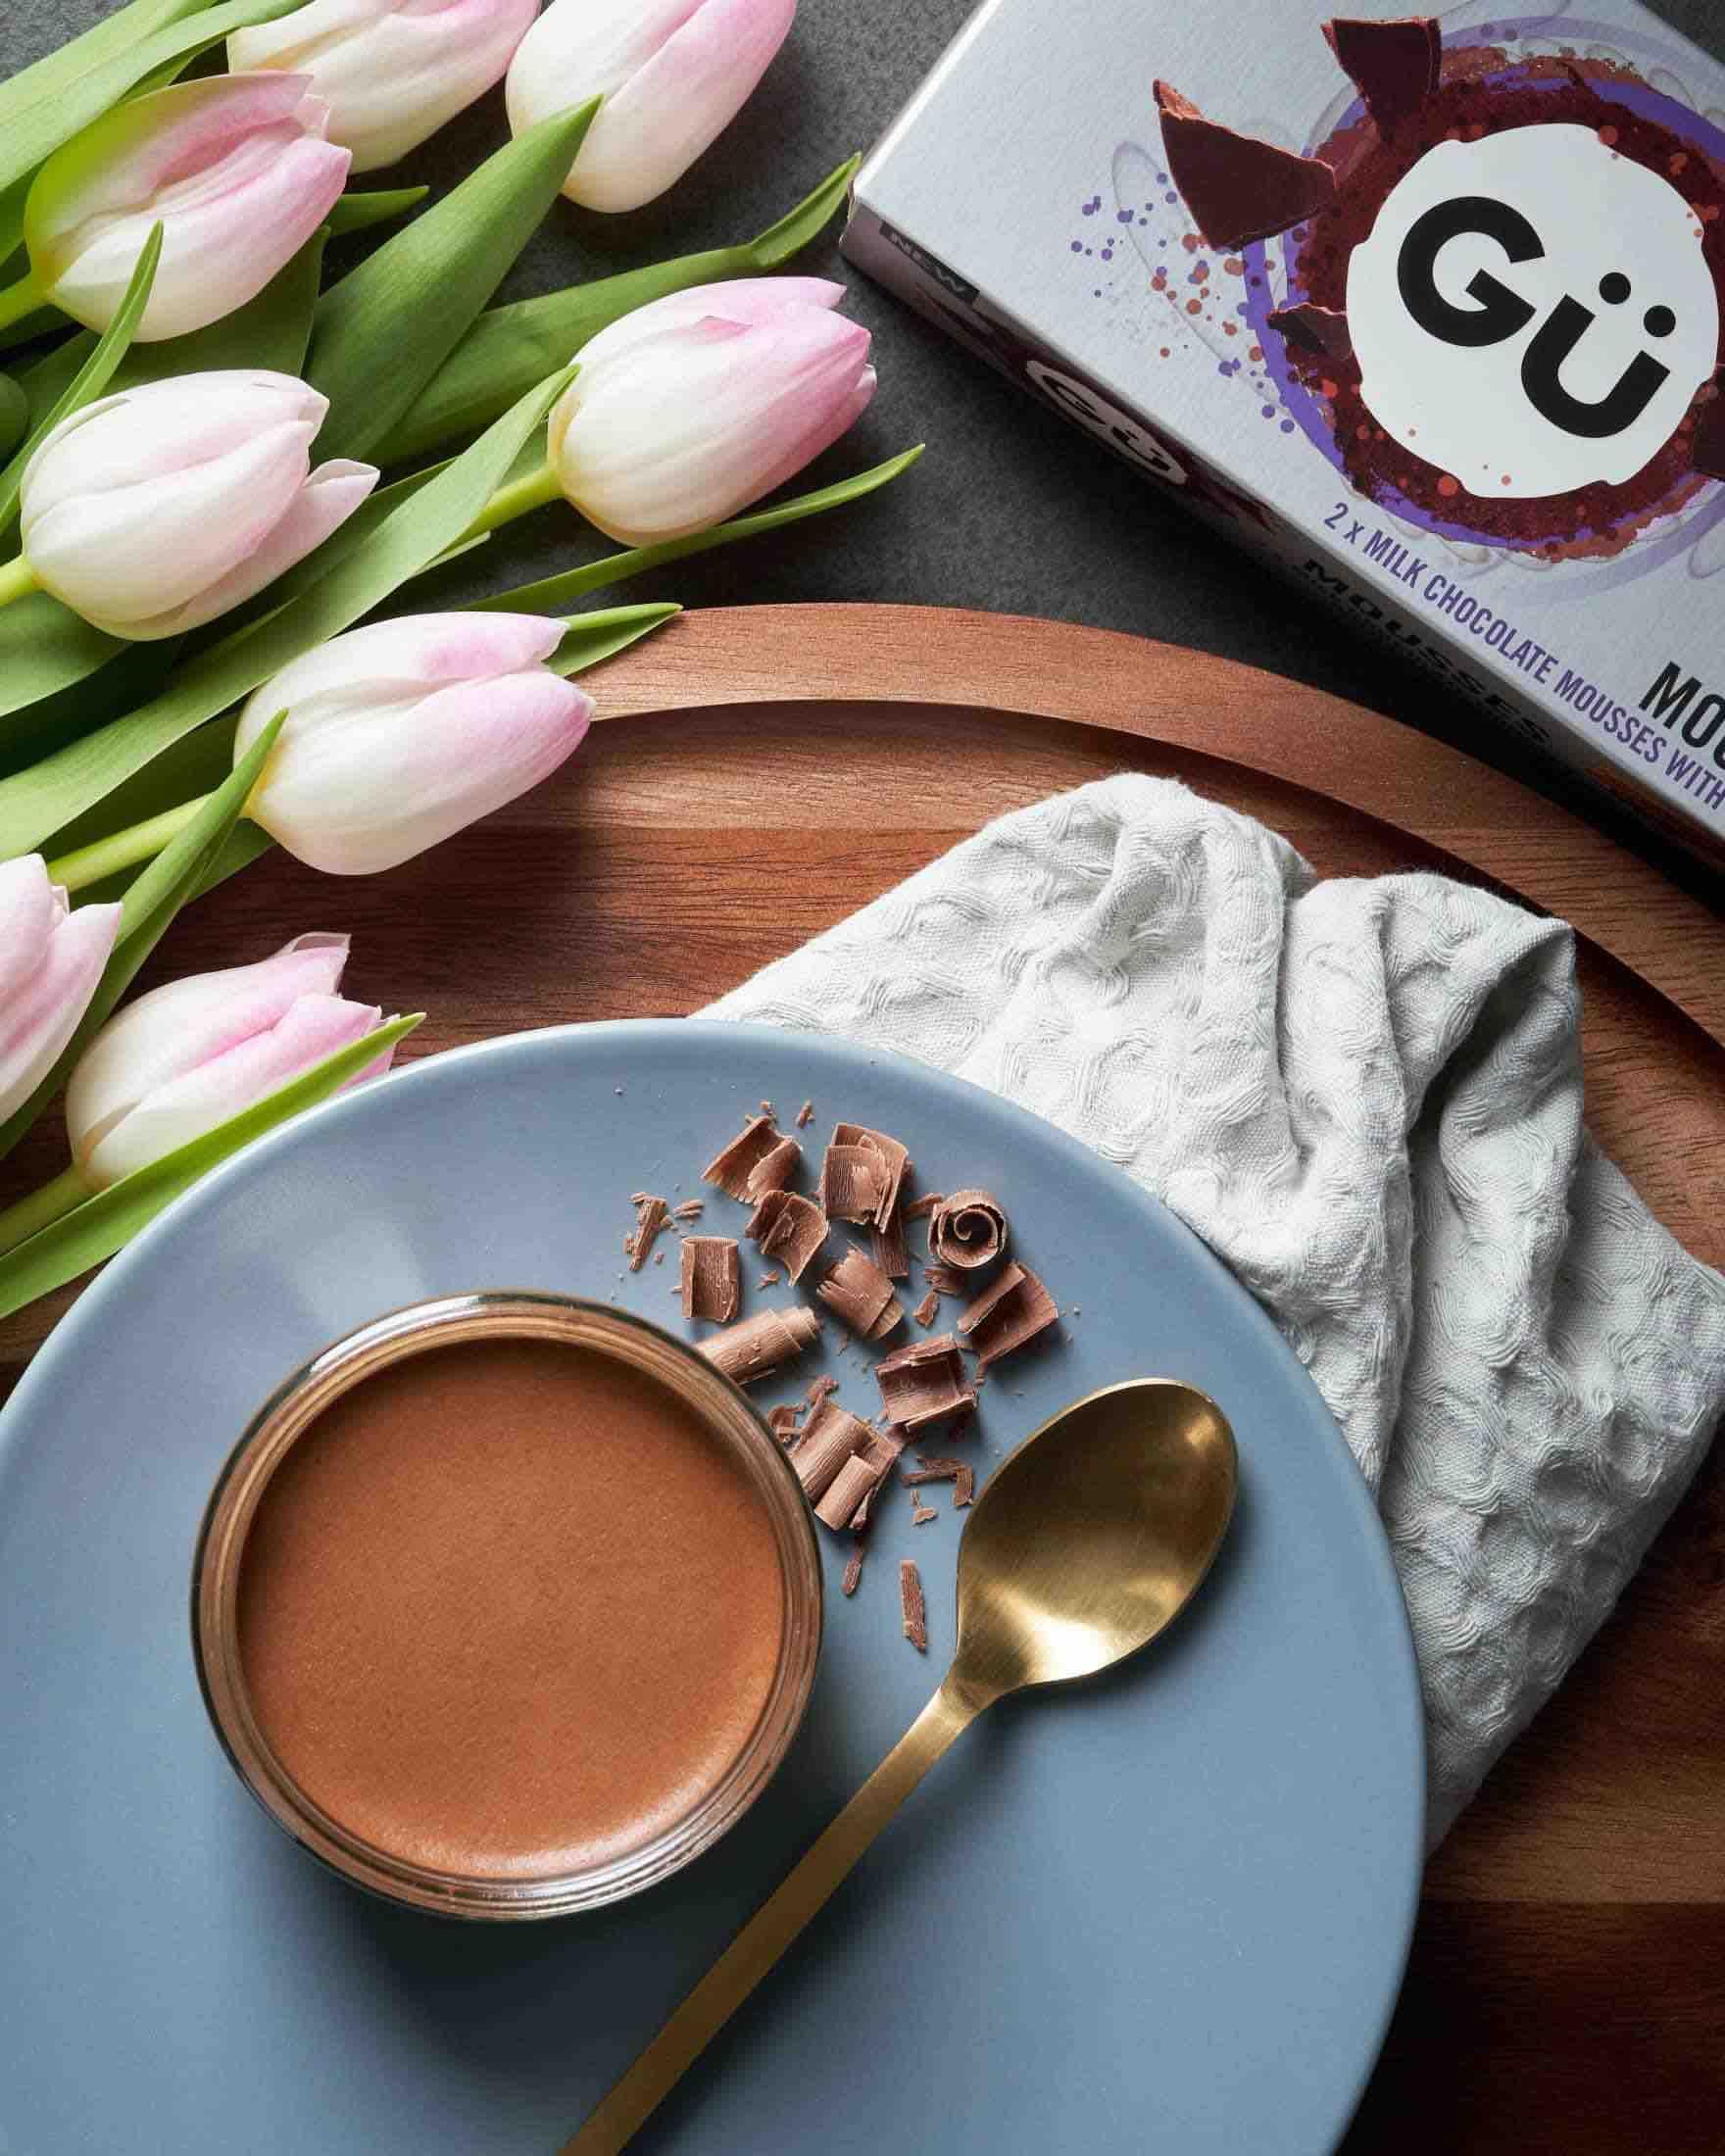 Gü Milk Chocolate Mousse & Ganache Flowers